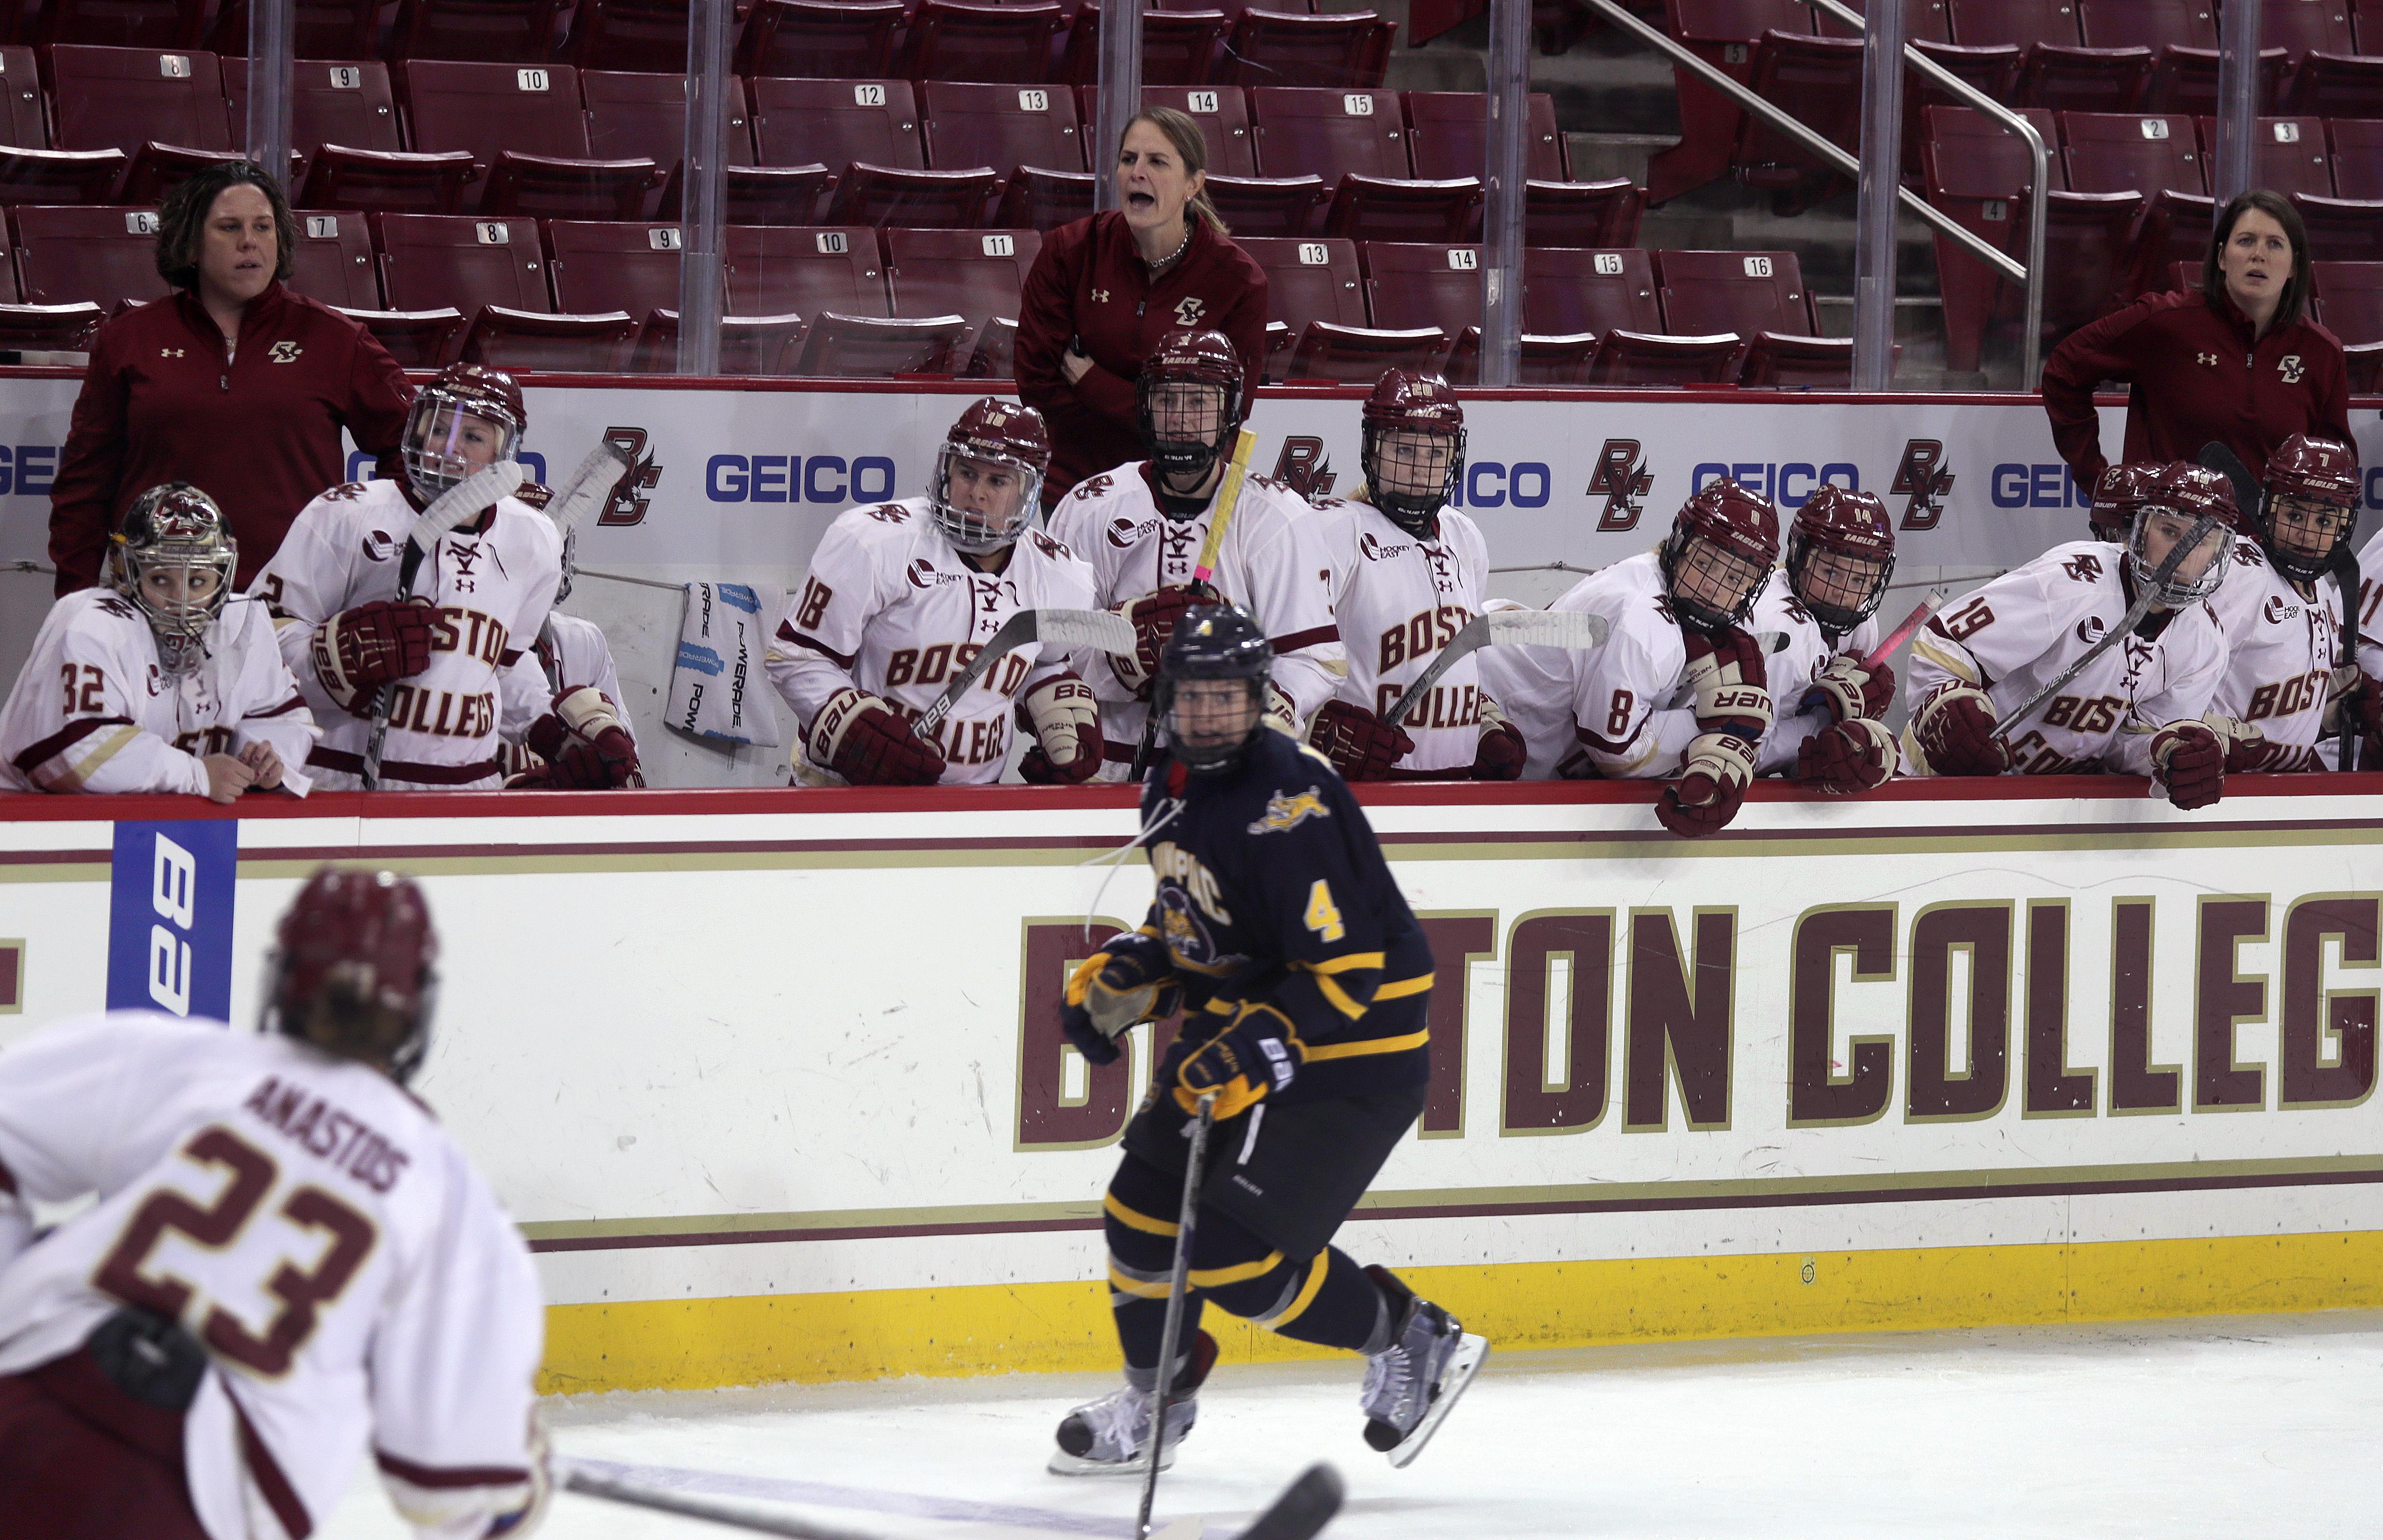 Boston College Women's Hockey Coachs